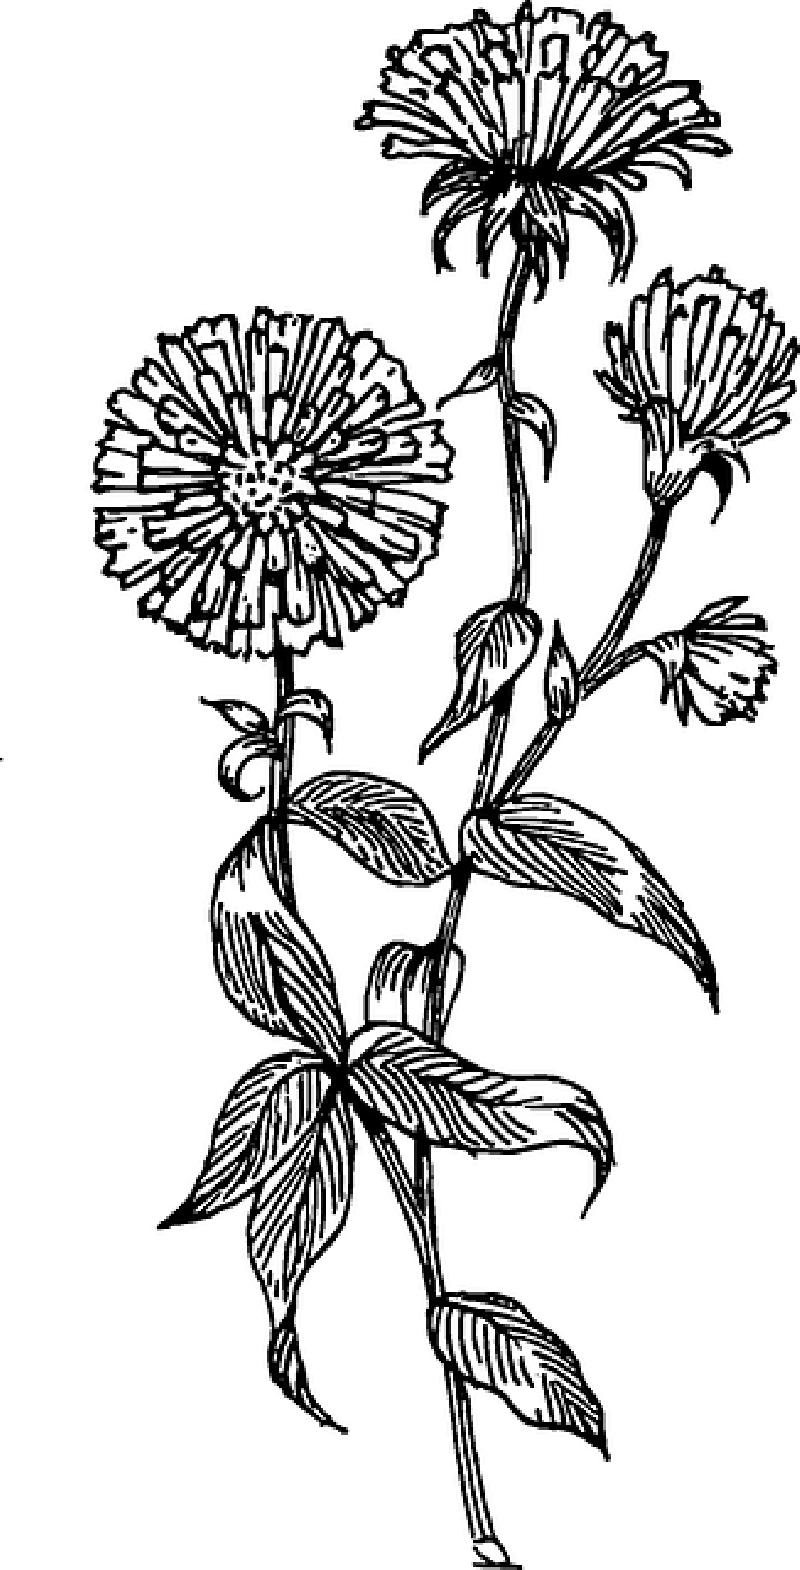 Birth Month Flowers Aster September In 2020 Birth Flower Tattoos Aster Flower Tattoos Small Flower Tattoos